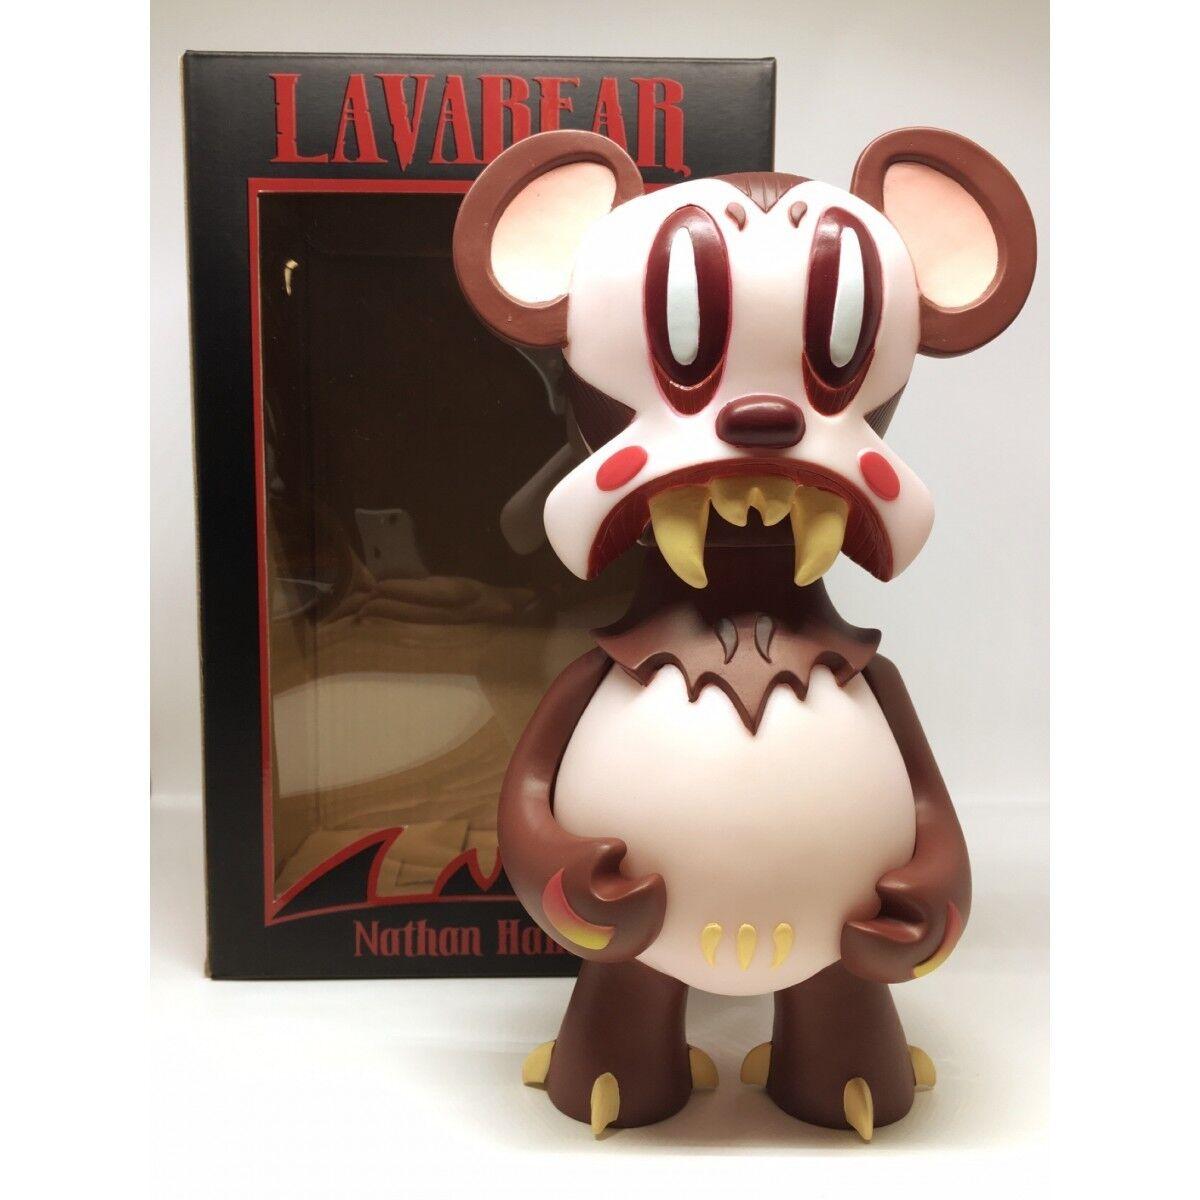 Nathan hamill 3dretro - 8  lavabear (mammalia edition) limited edition von 150